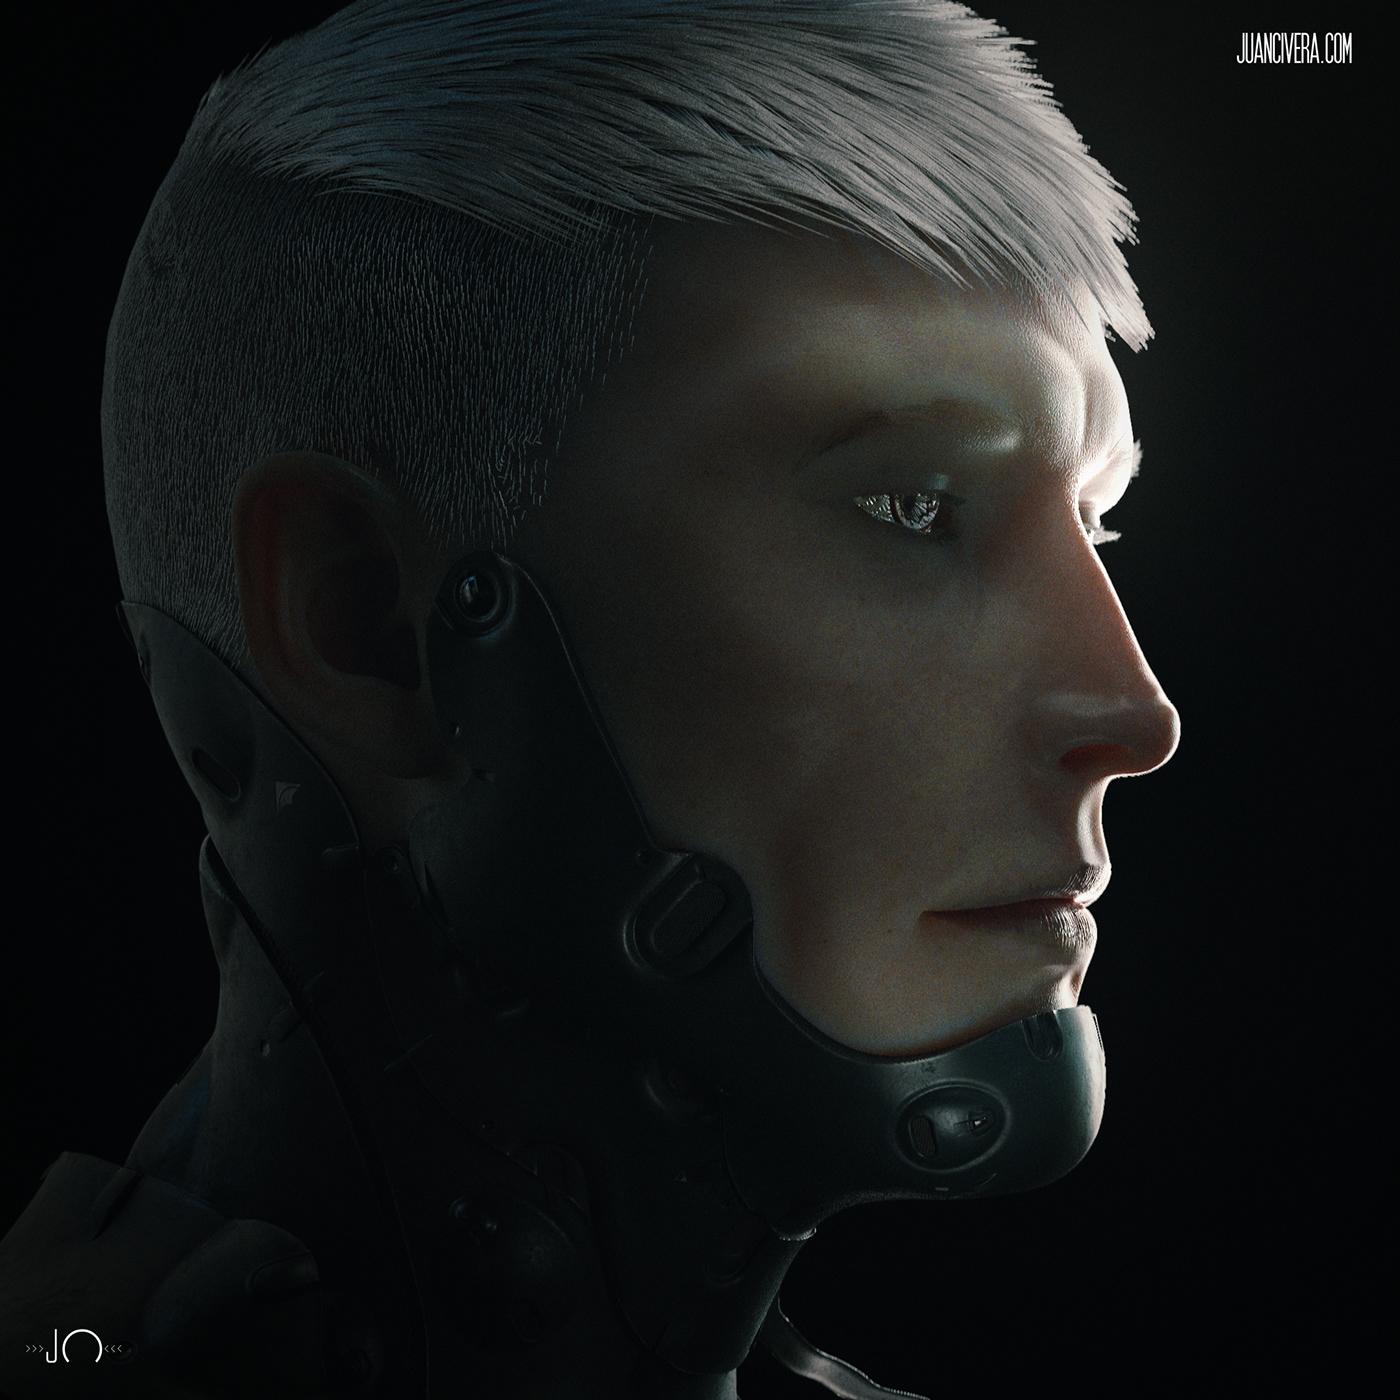 Image may contain: person, screenshot and human face